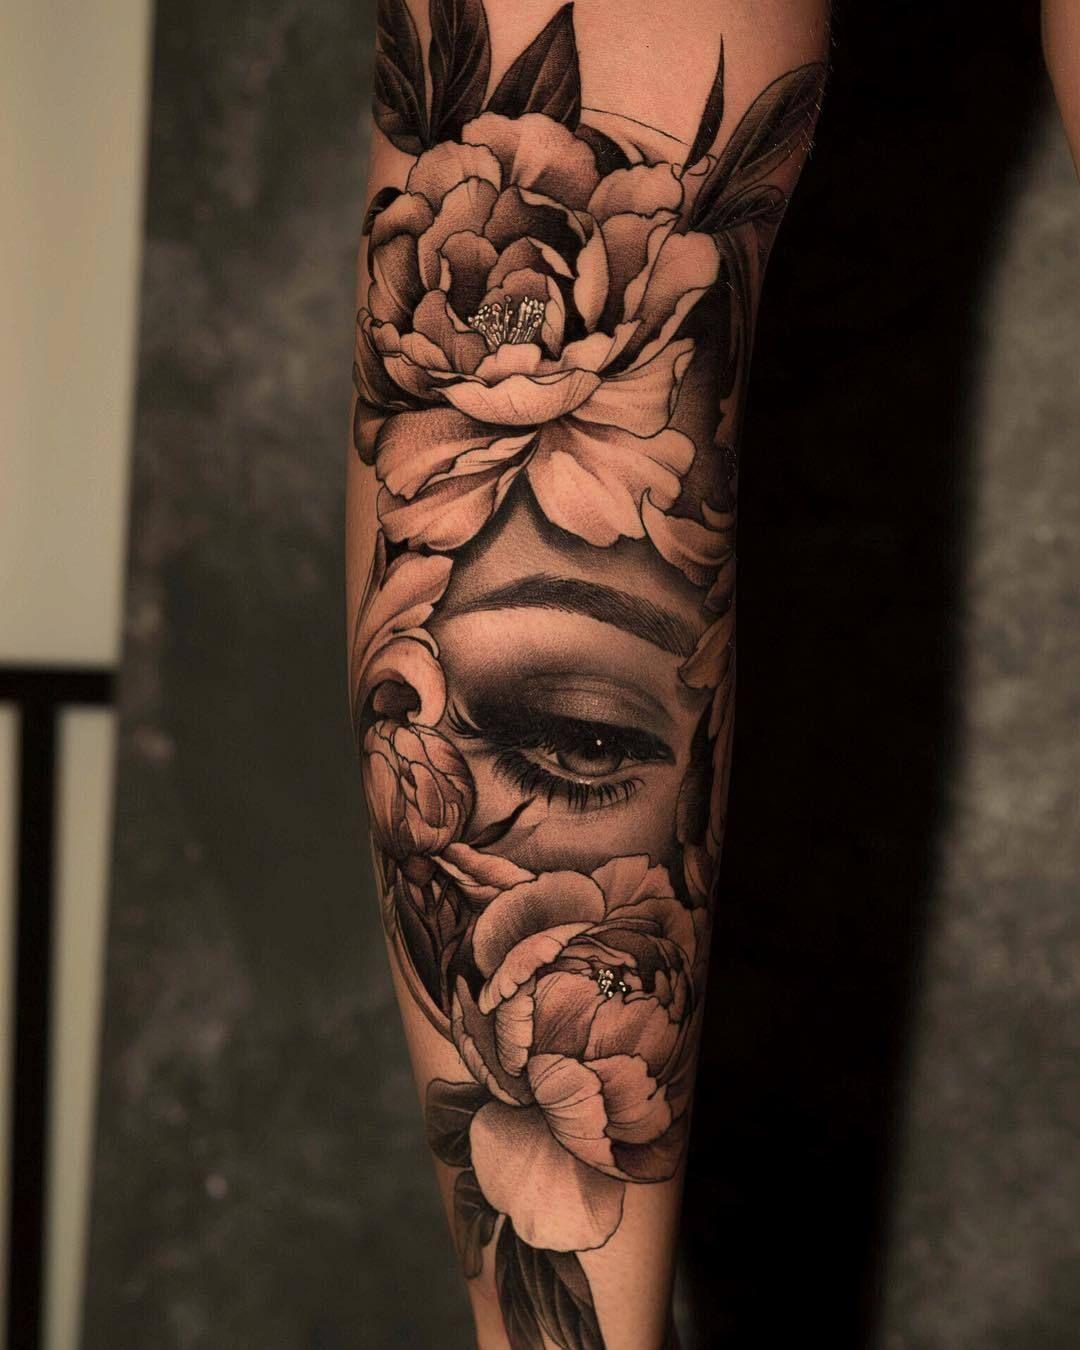 ElectricTattoos -  JasonBates  - #electrictattoos #tattooideascollarbone #tattooideasformen #tattooideassmall #tattooideasunique